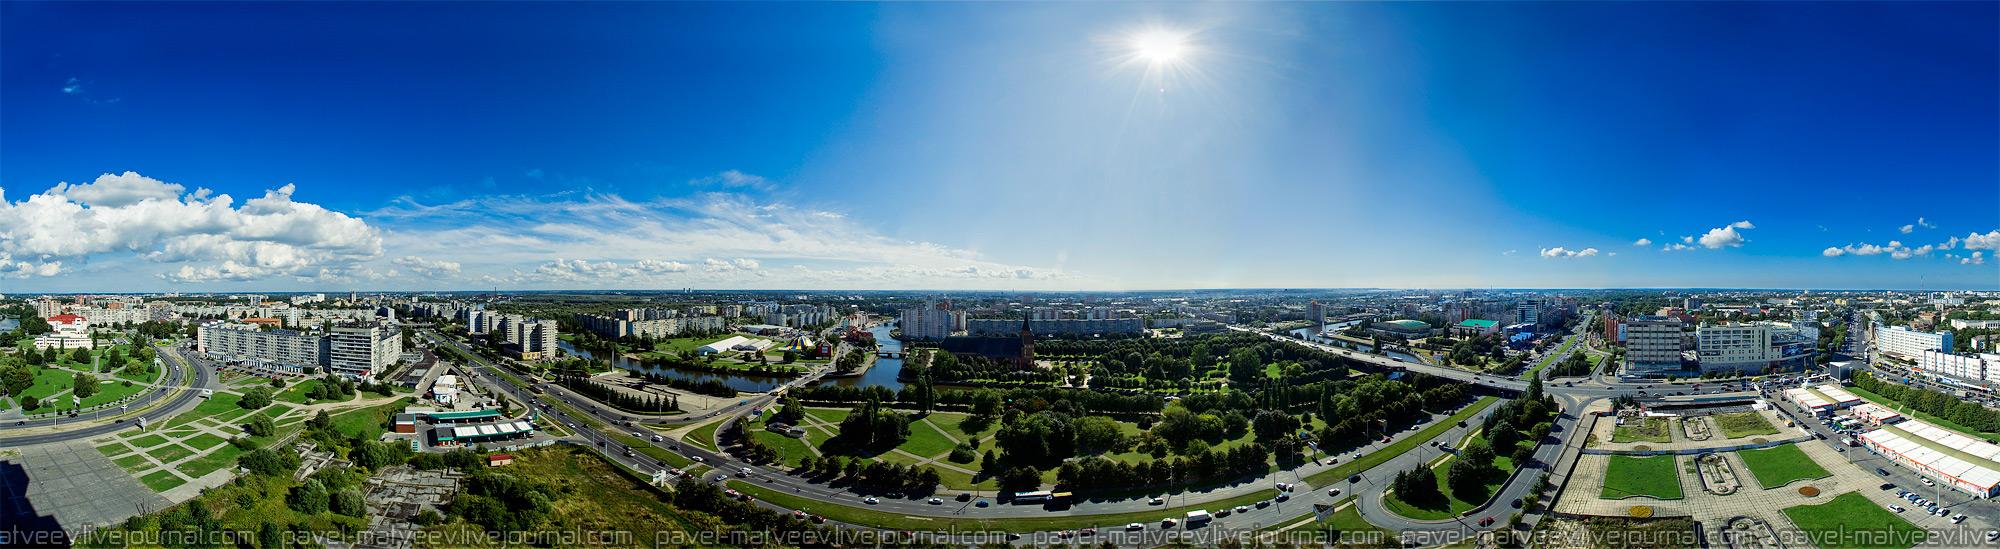 ДАПОКСЕТИН - DAPOXETINE в Санкт-Петербурге.